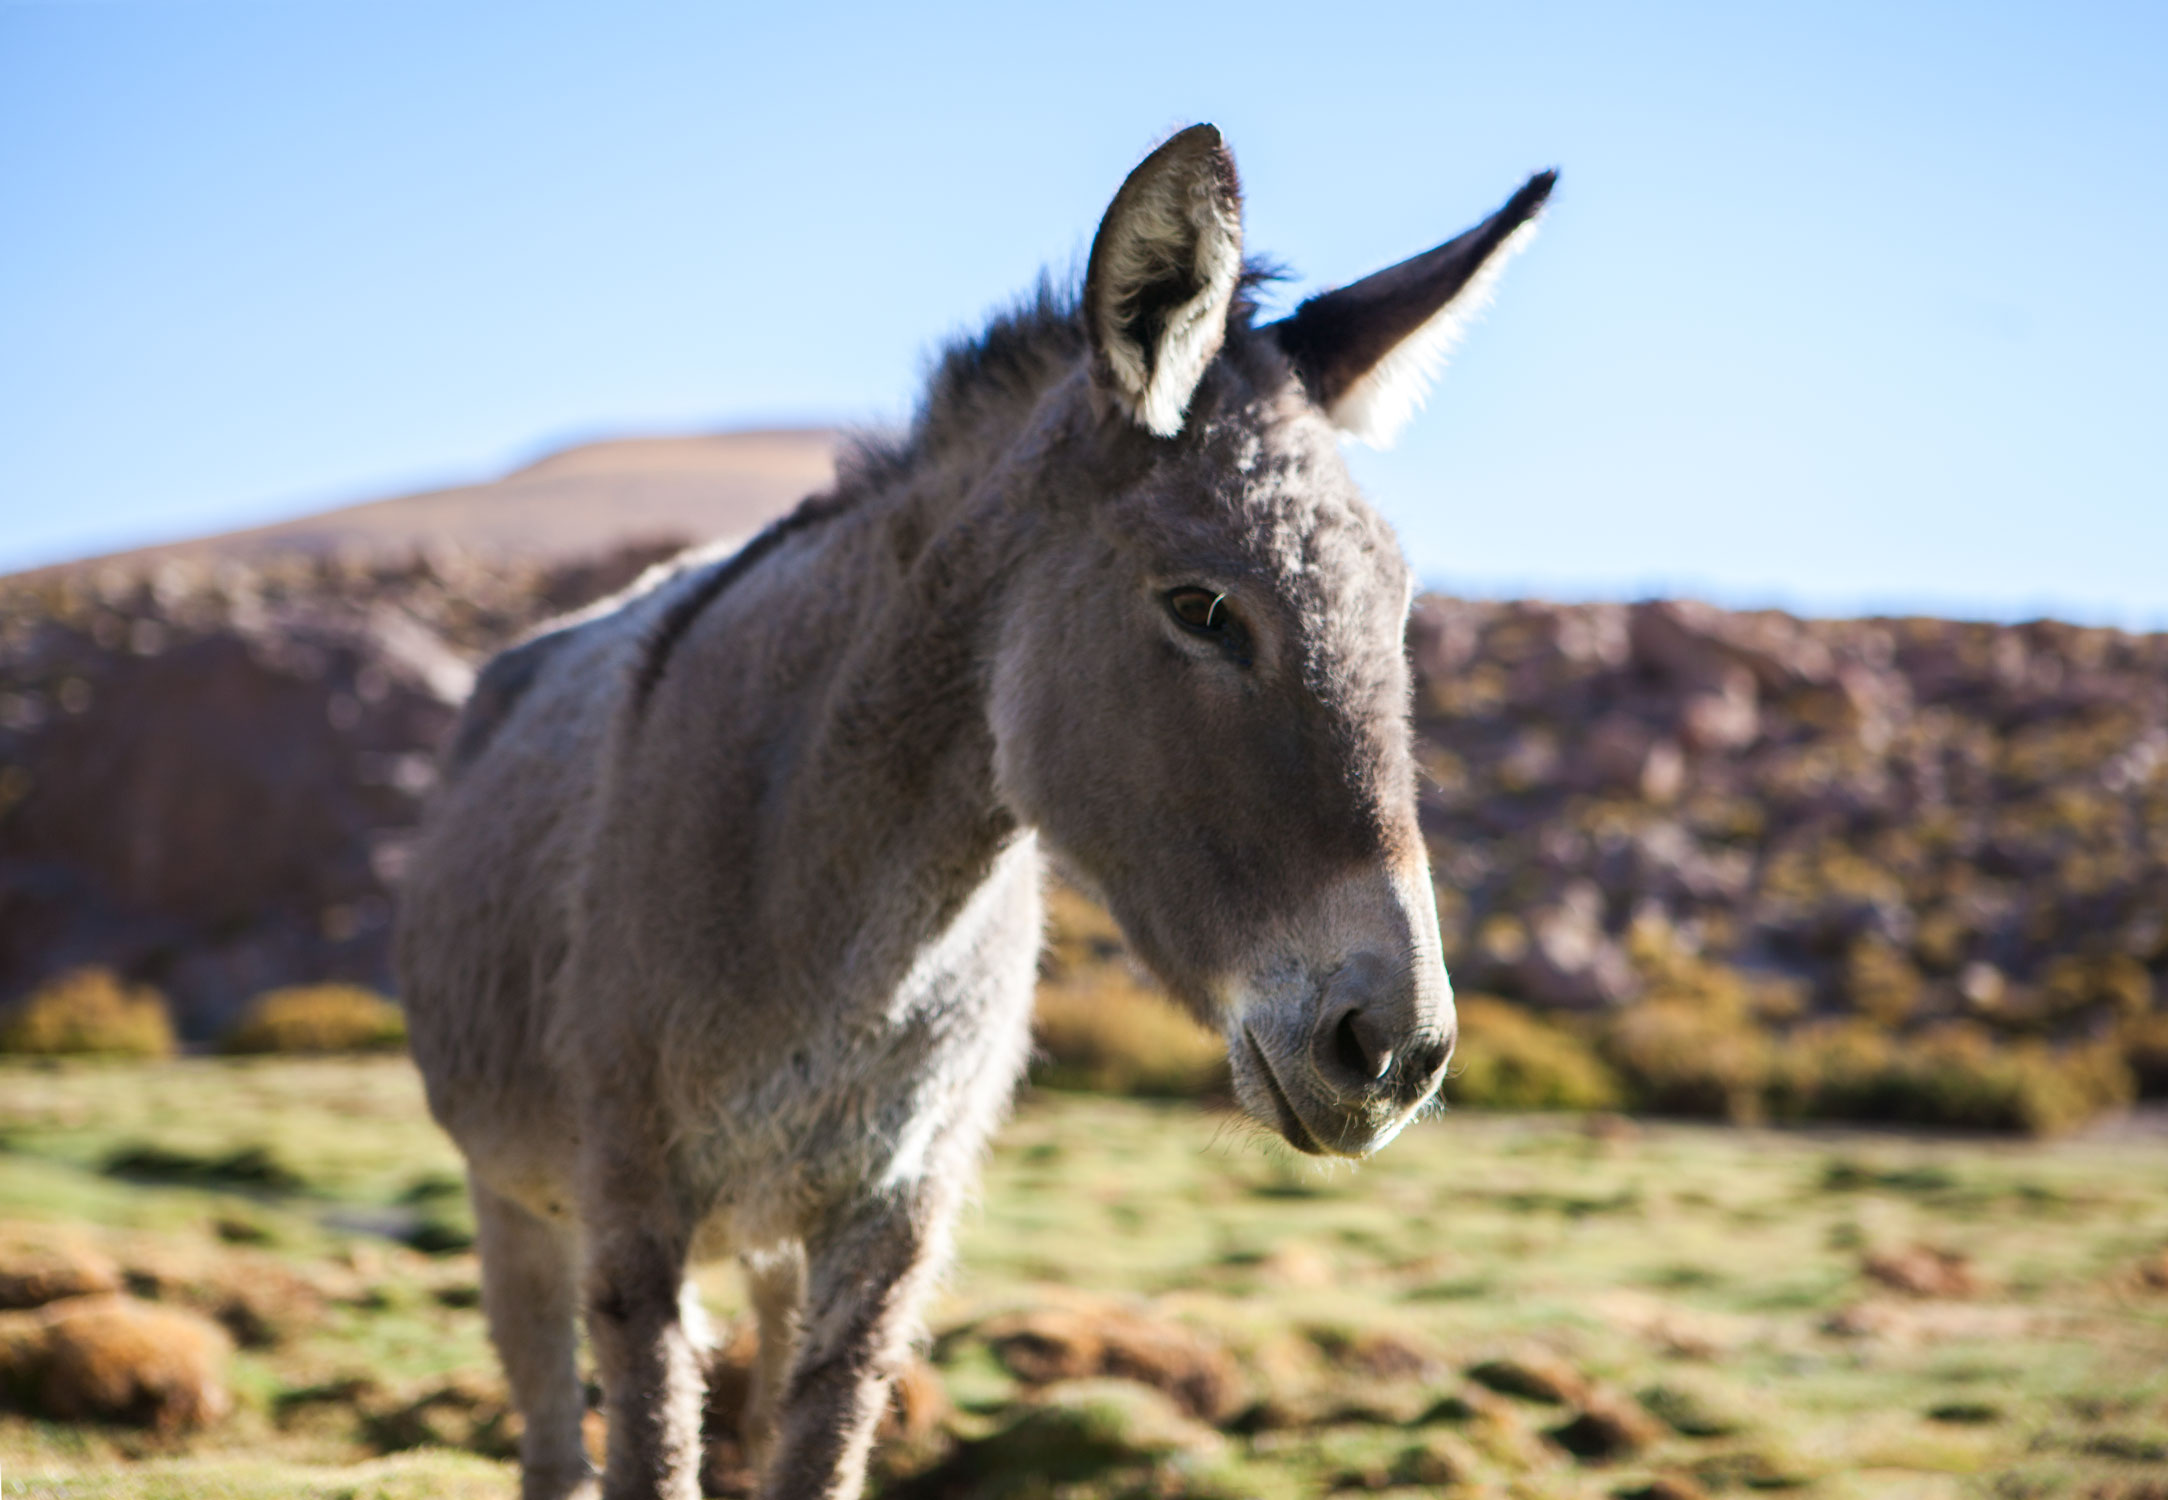 atacama-desert-chile-wander-south-animals-donkey-2.jpg